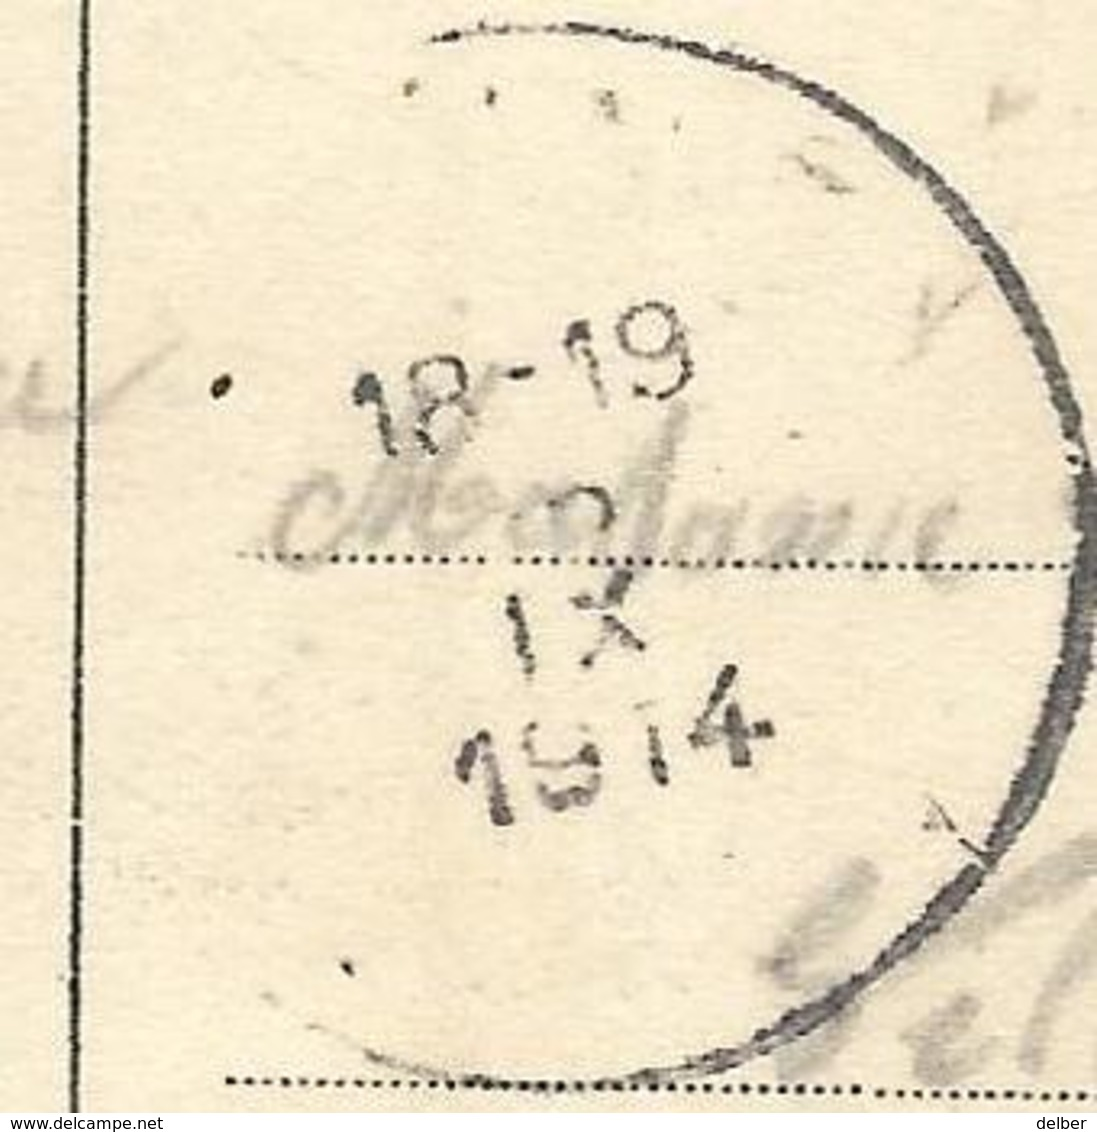 Op-396: S.M. BOUCHOUTE(LIER) 15 IX 1914 > PANNE 5 IX 1914 : Pk: Bouchout -Buitengoed E.SCHAEDELER - Invasión